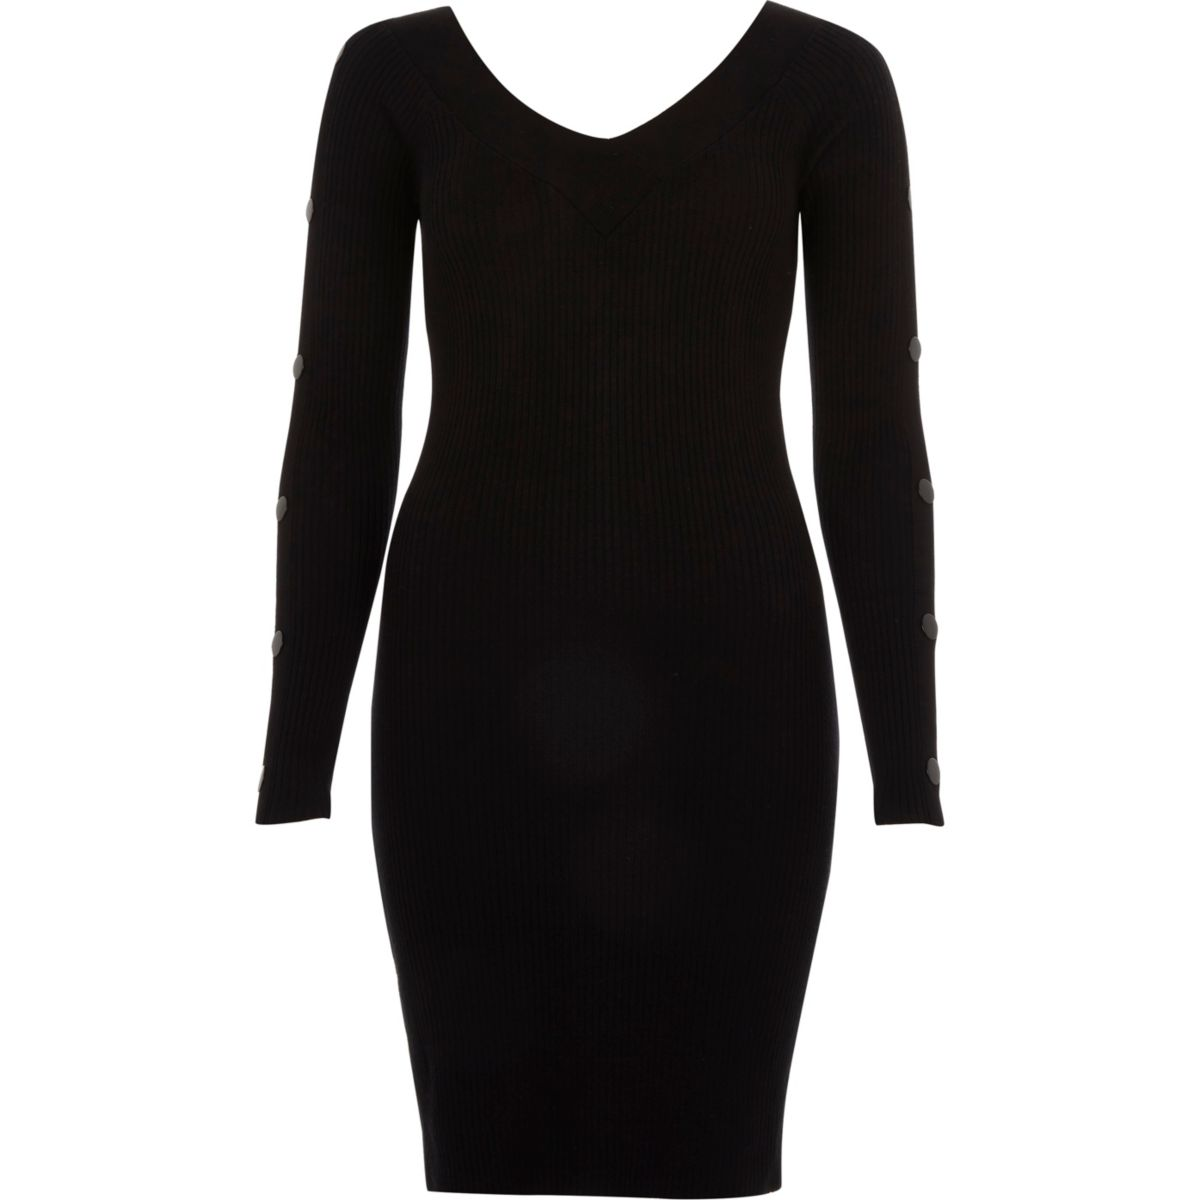 Black rib knit hardware sleeve bodycon dress